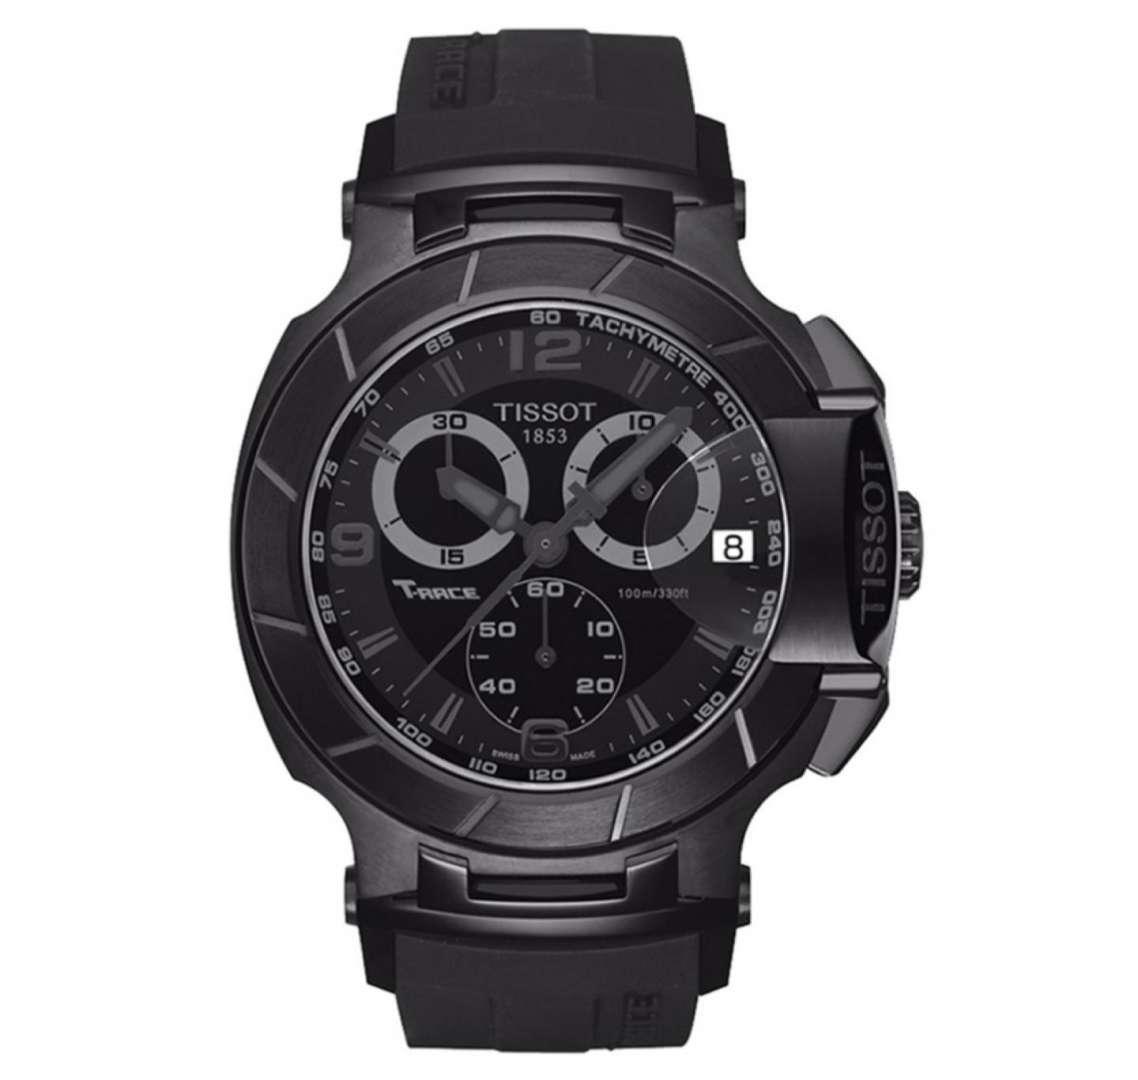 שעון יד אנלוגי tissot t048.417.37.057.00 טיסו